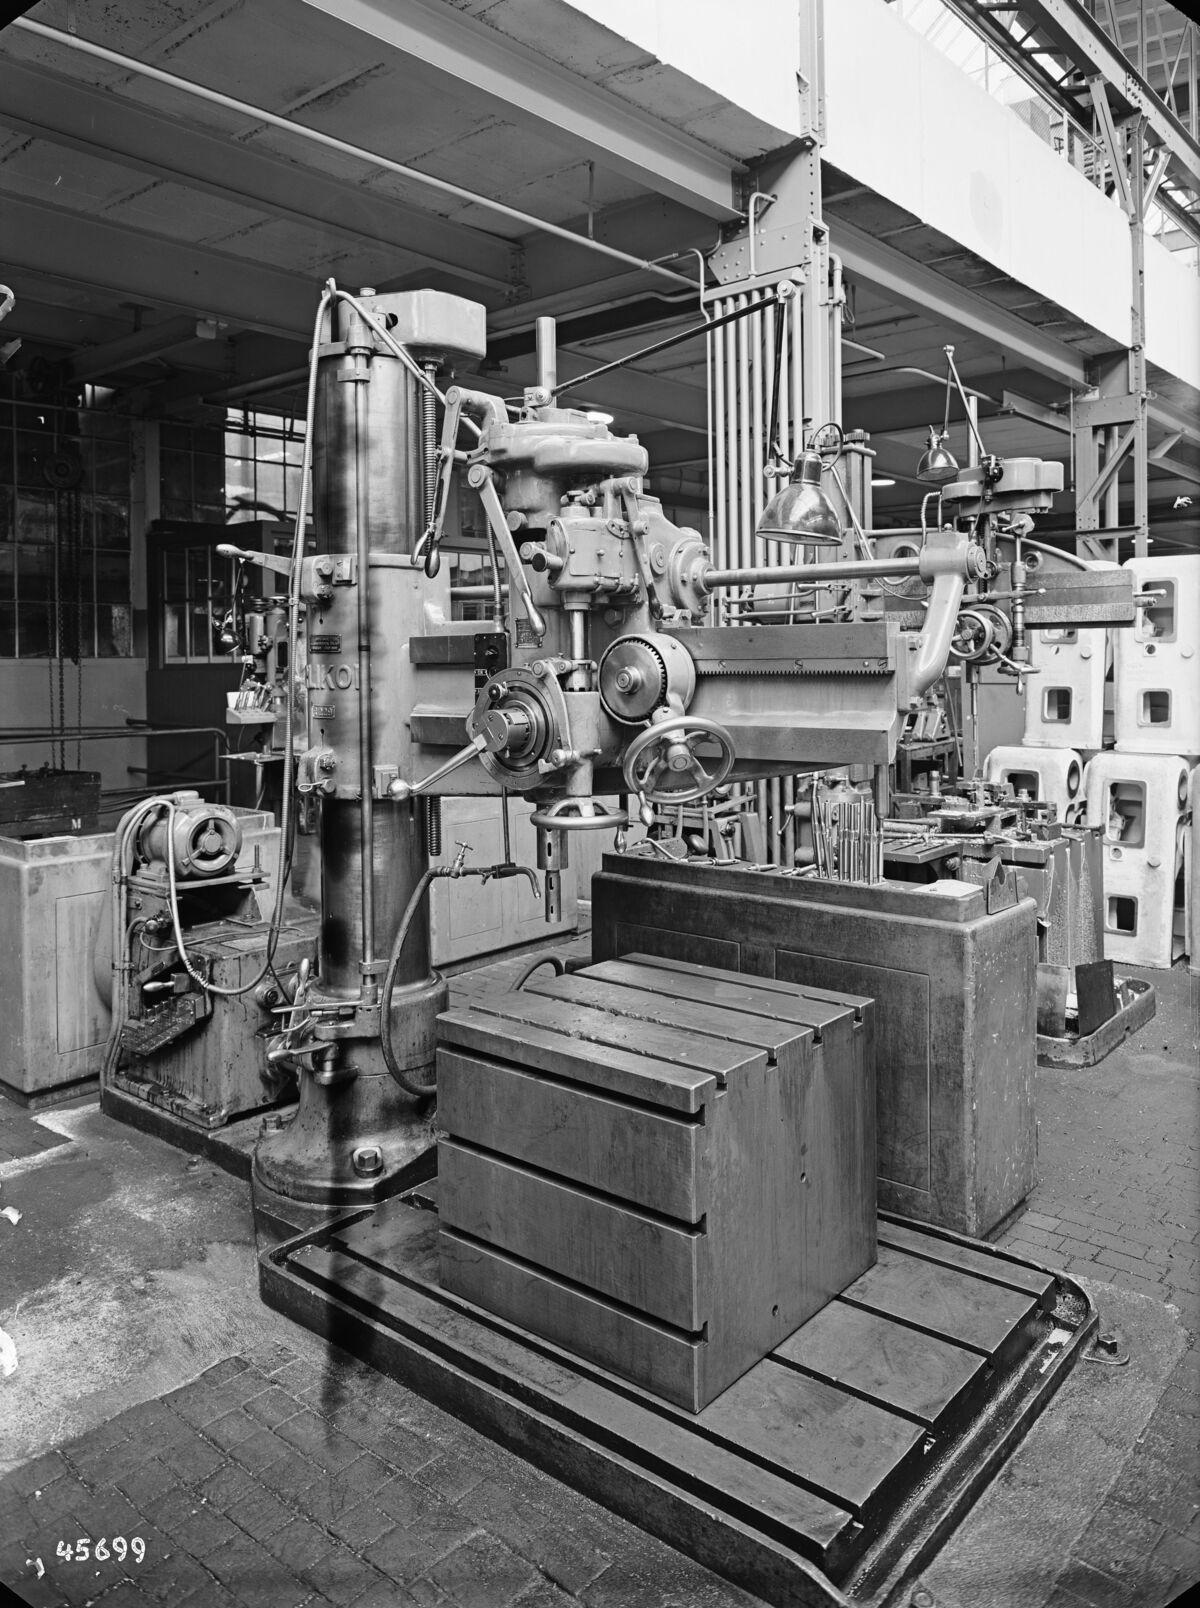 GFA 16/45699: Vertical boring mill